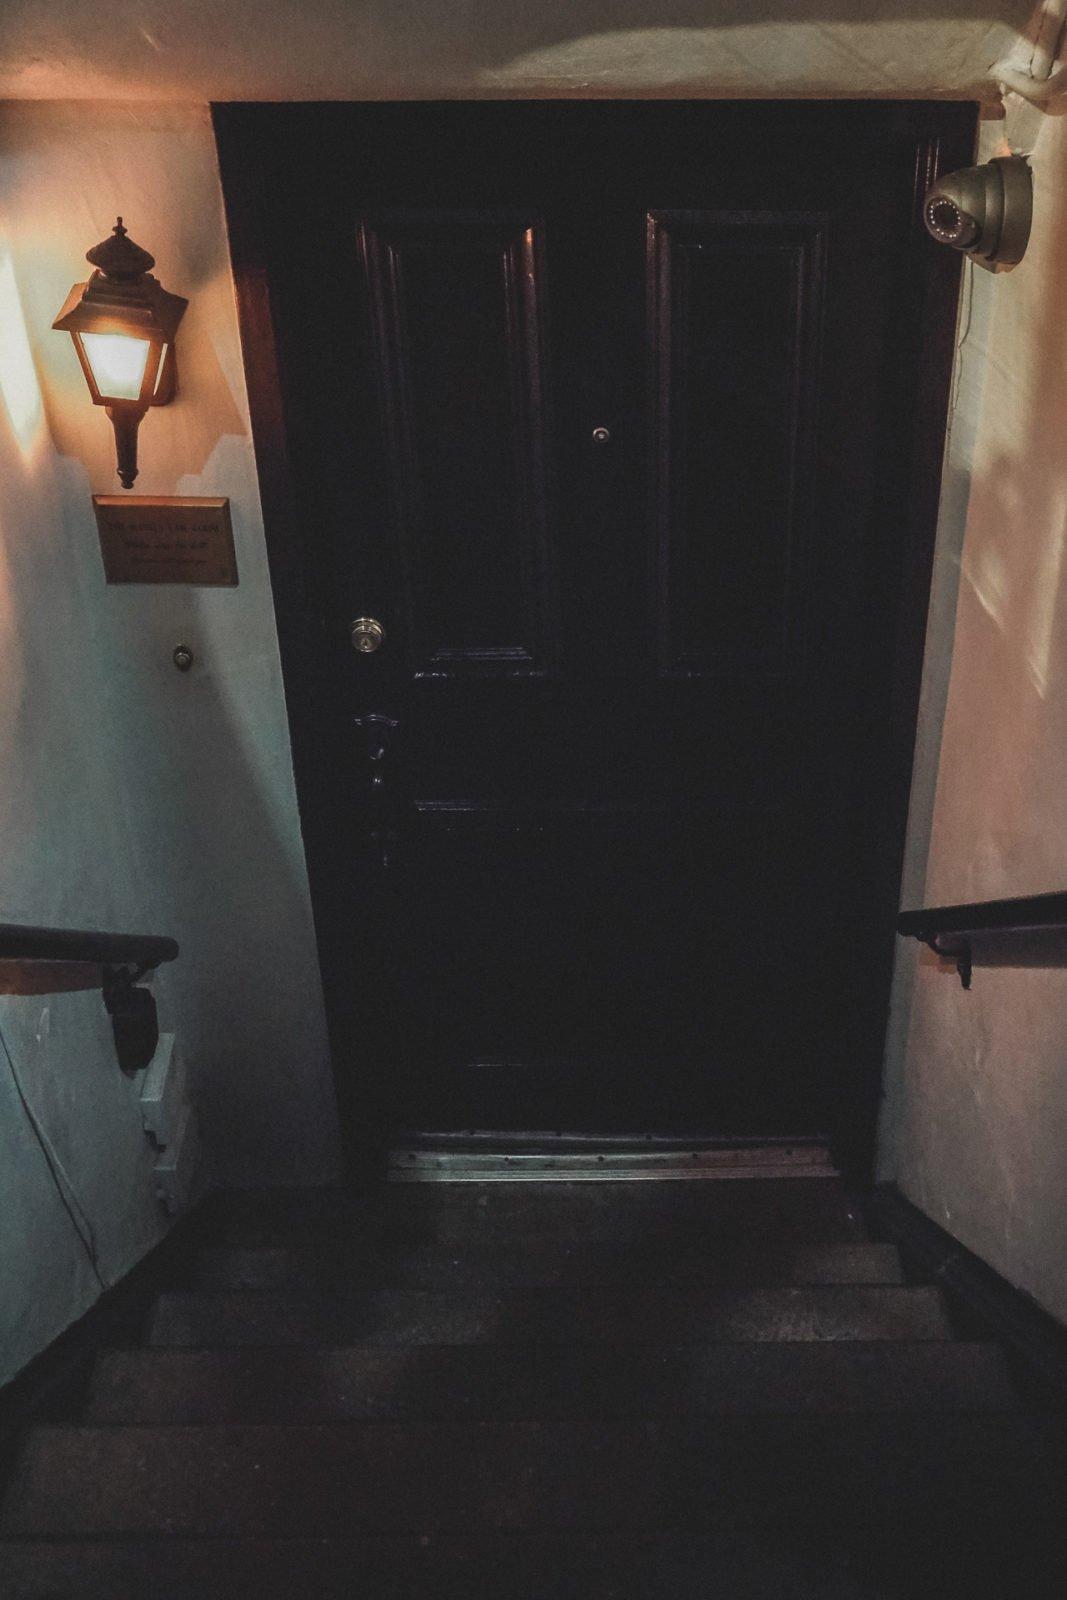 Raines Law Room New York City Secret Bar entrance